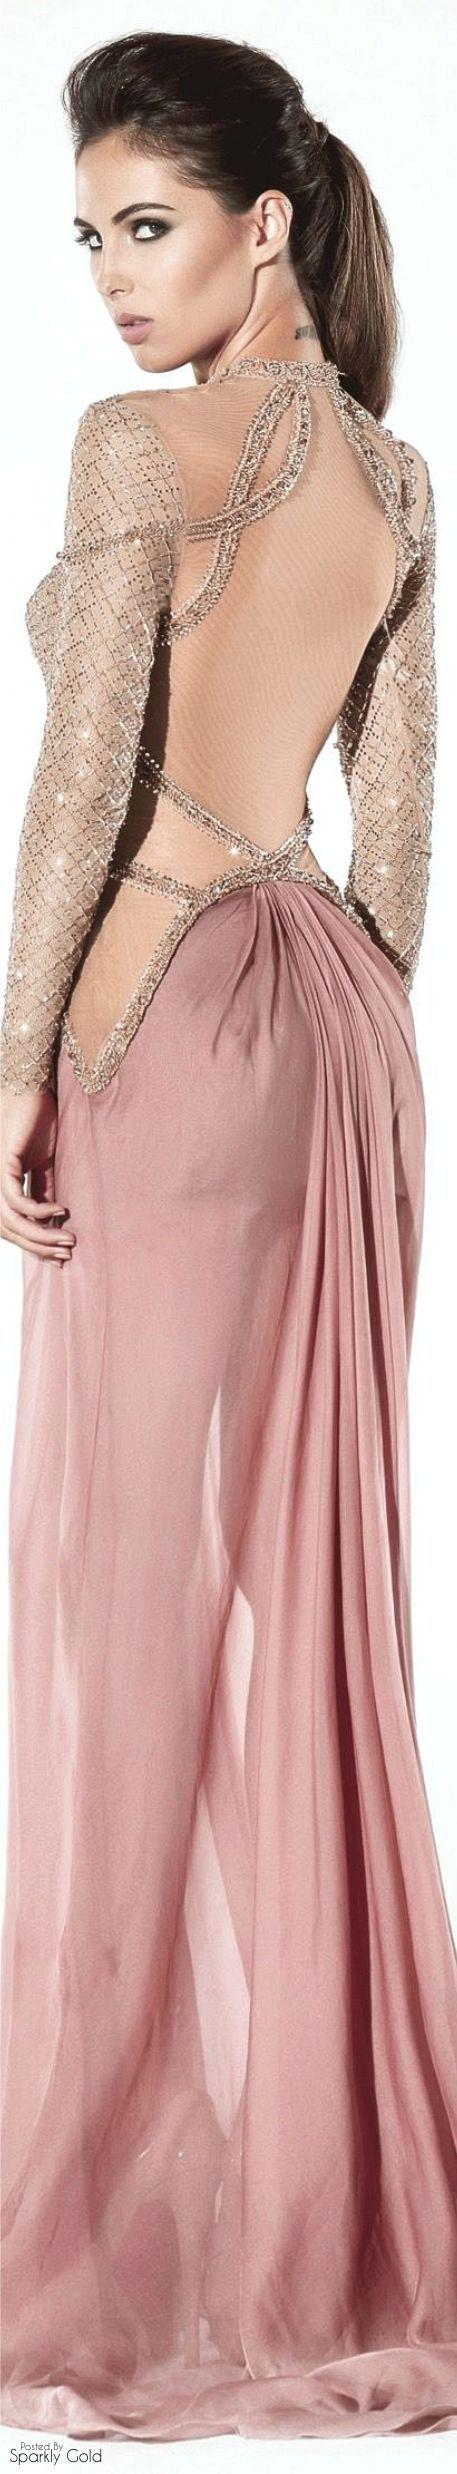 Charbel zoé spring couture escotes pinterest gowns